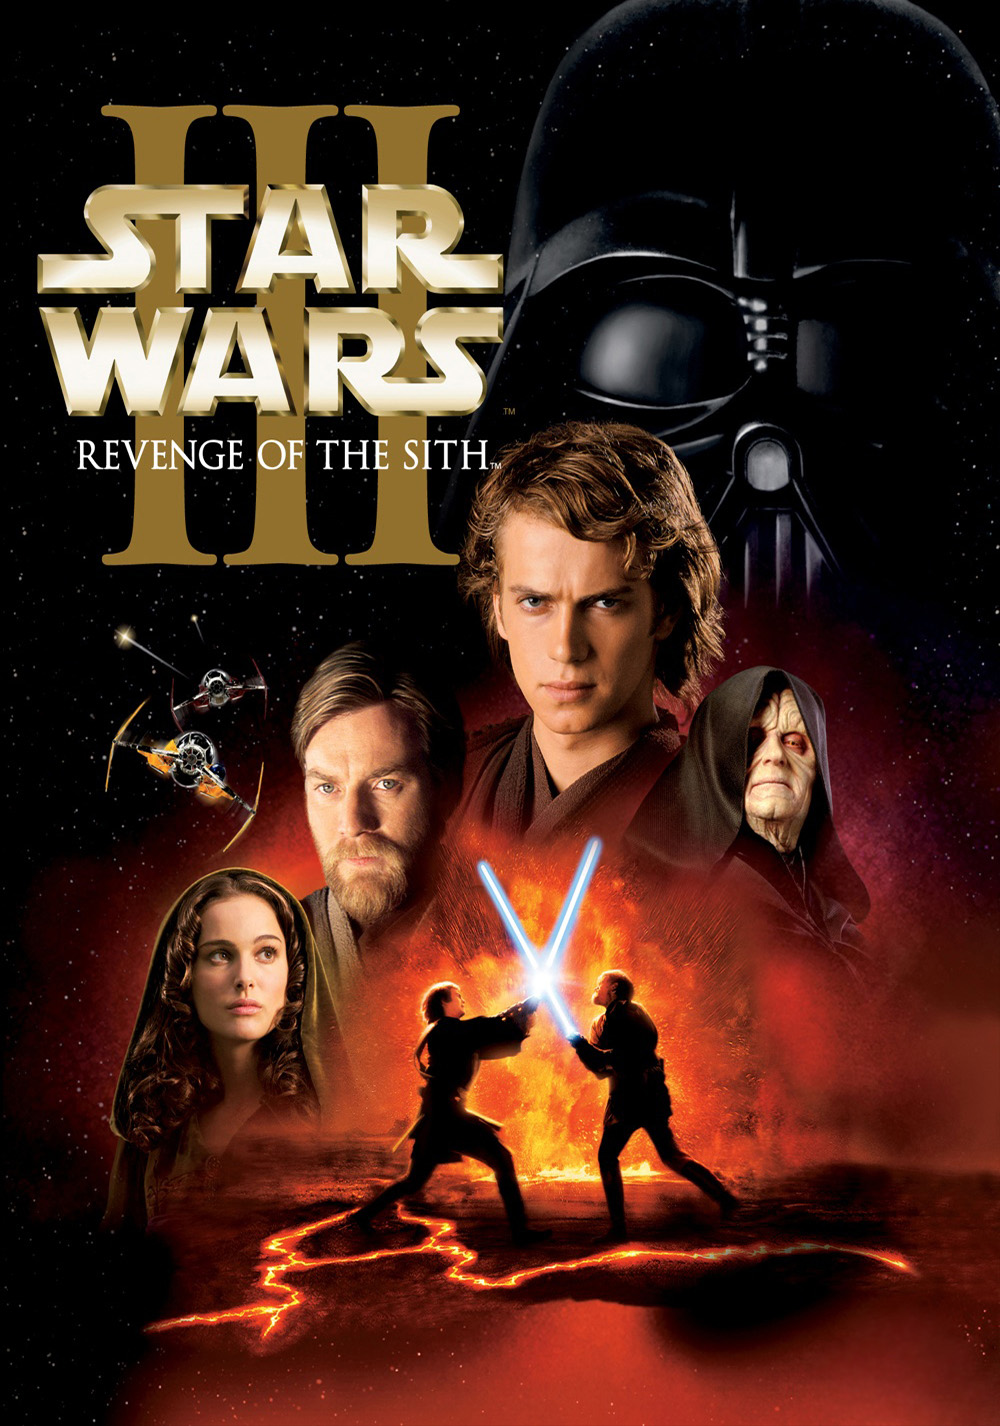 star-wars-episode-iii---revenge-of-the-sith-52130347679d5